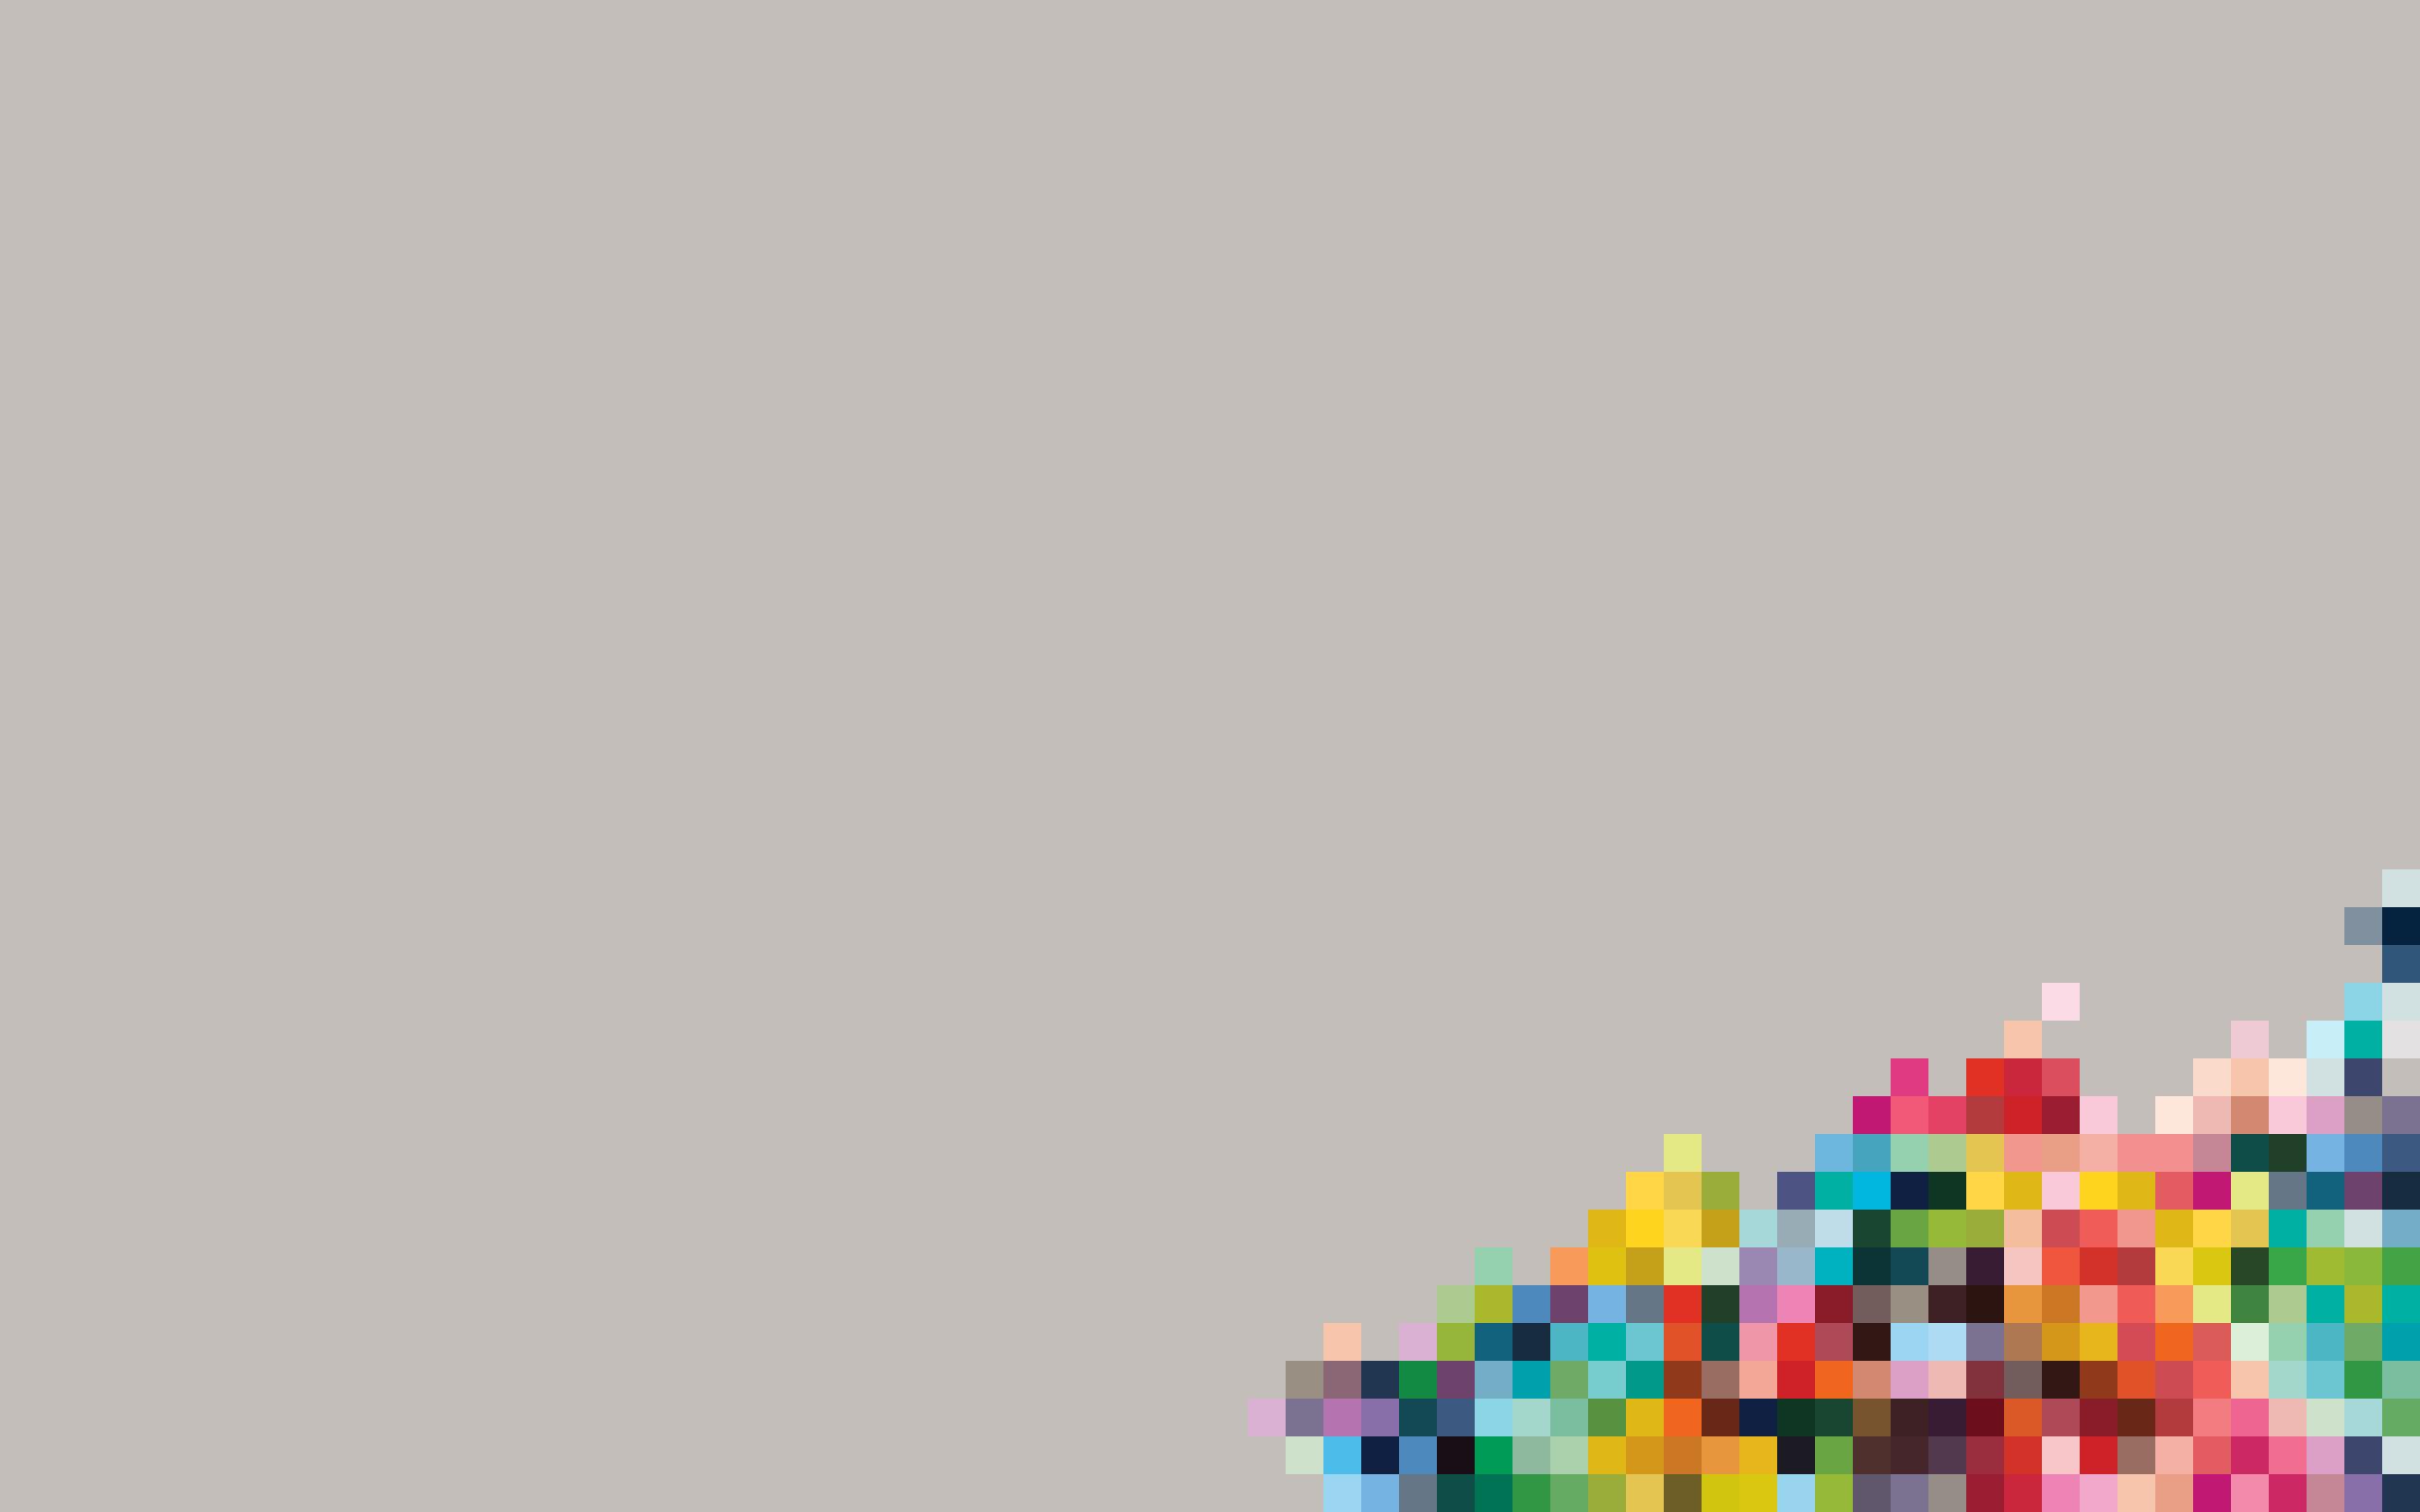 pixel wallpaperjpg 2560x1600